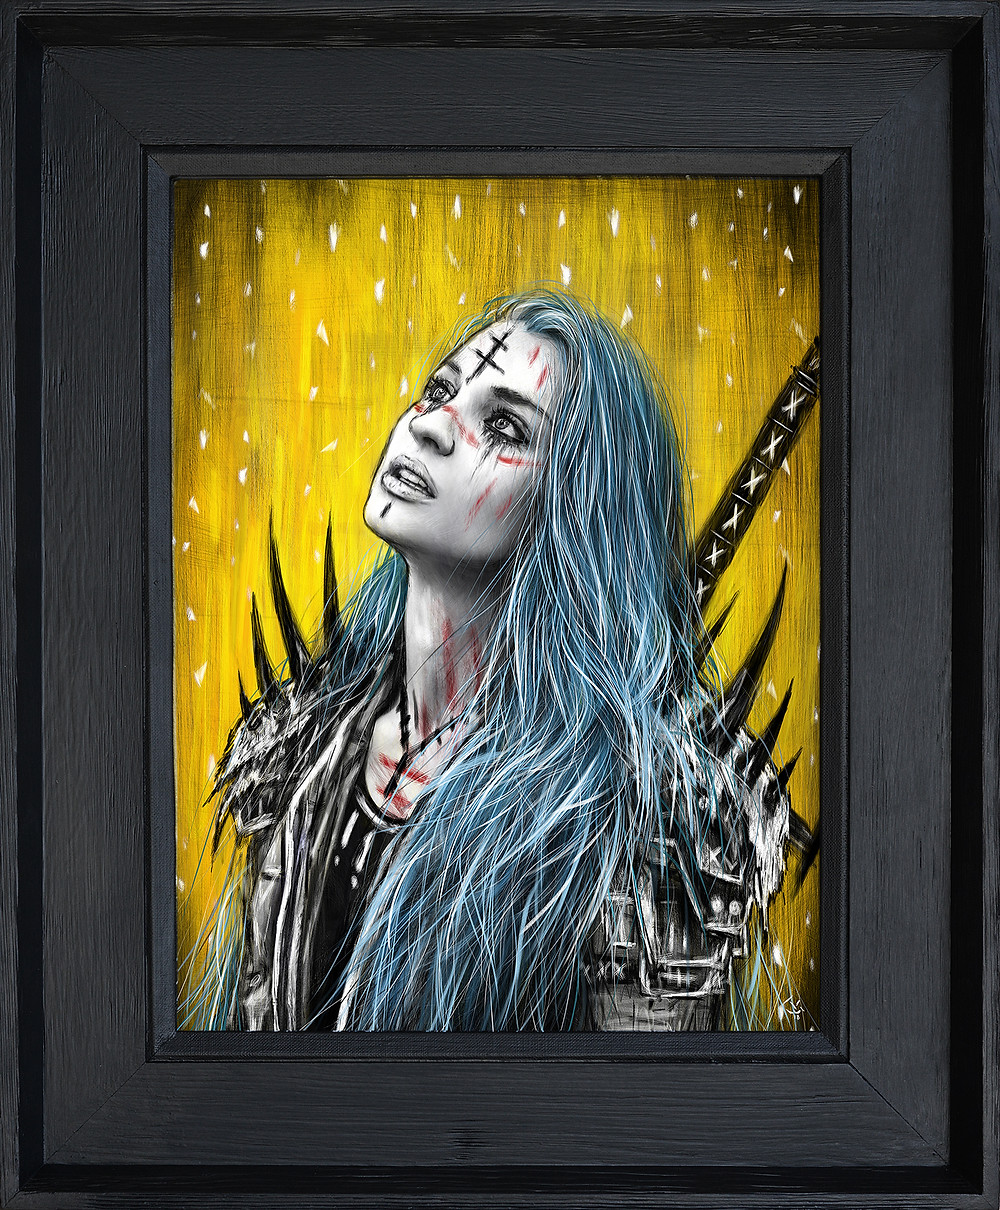 Gothic Fantasy Original Artwork by Justin Gedak